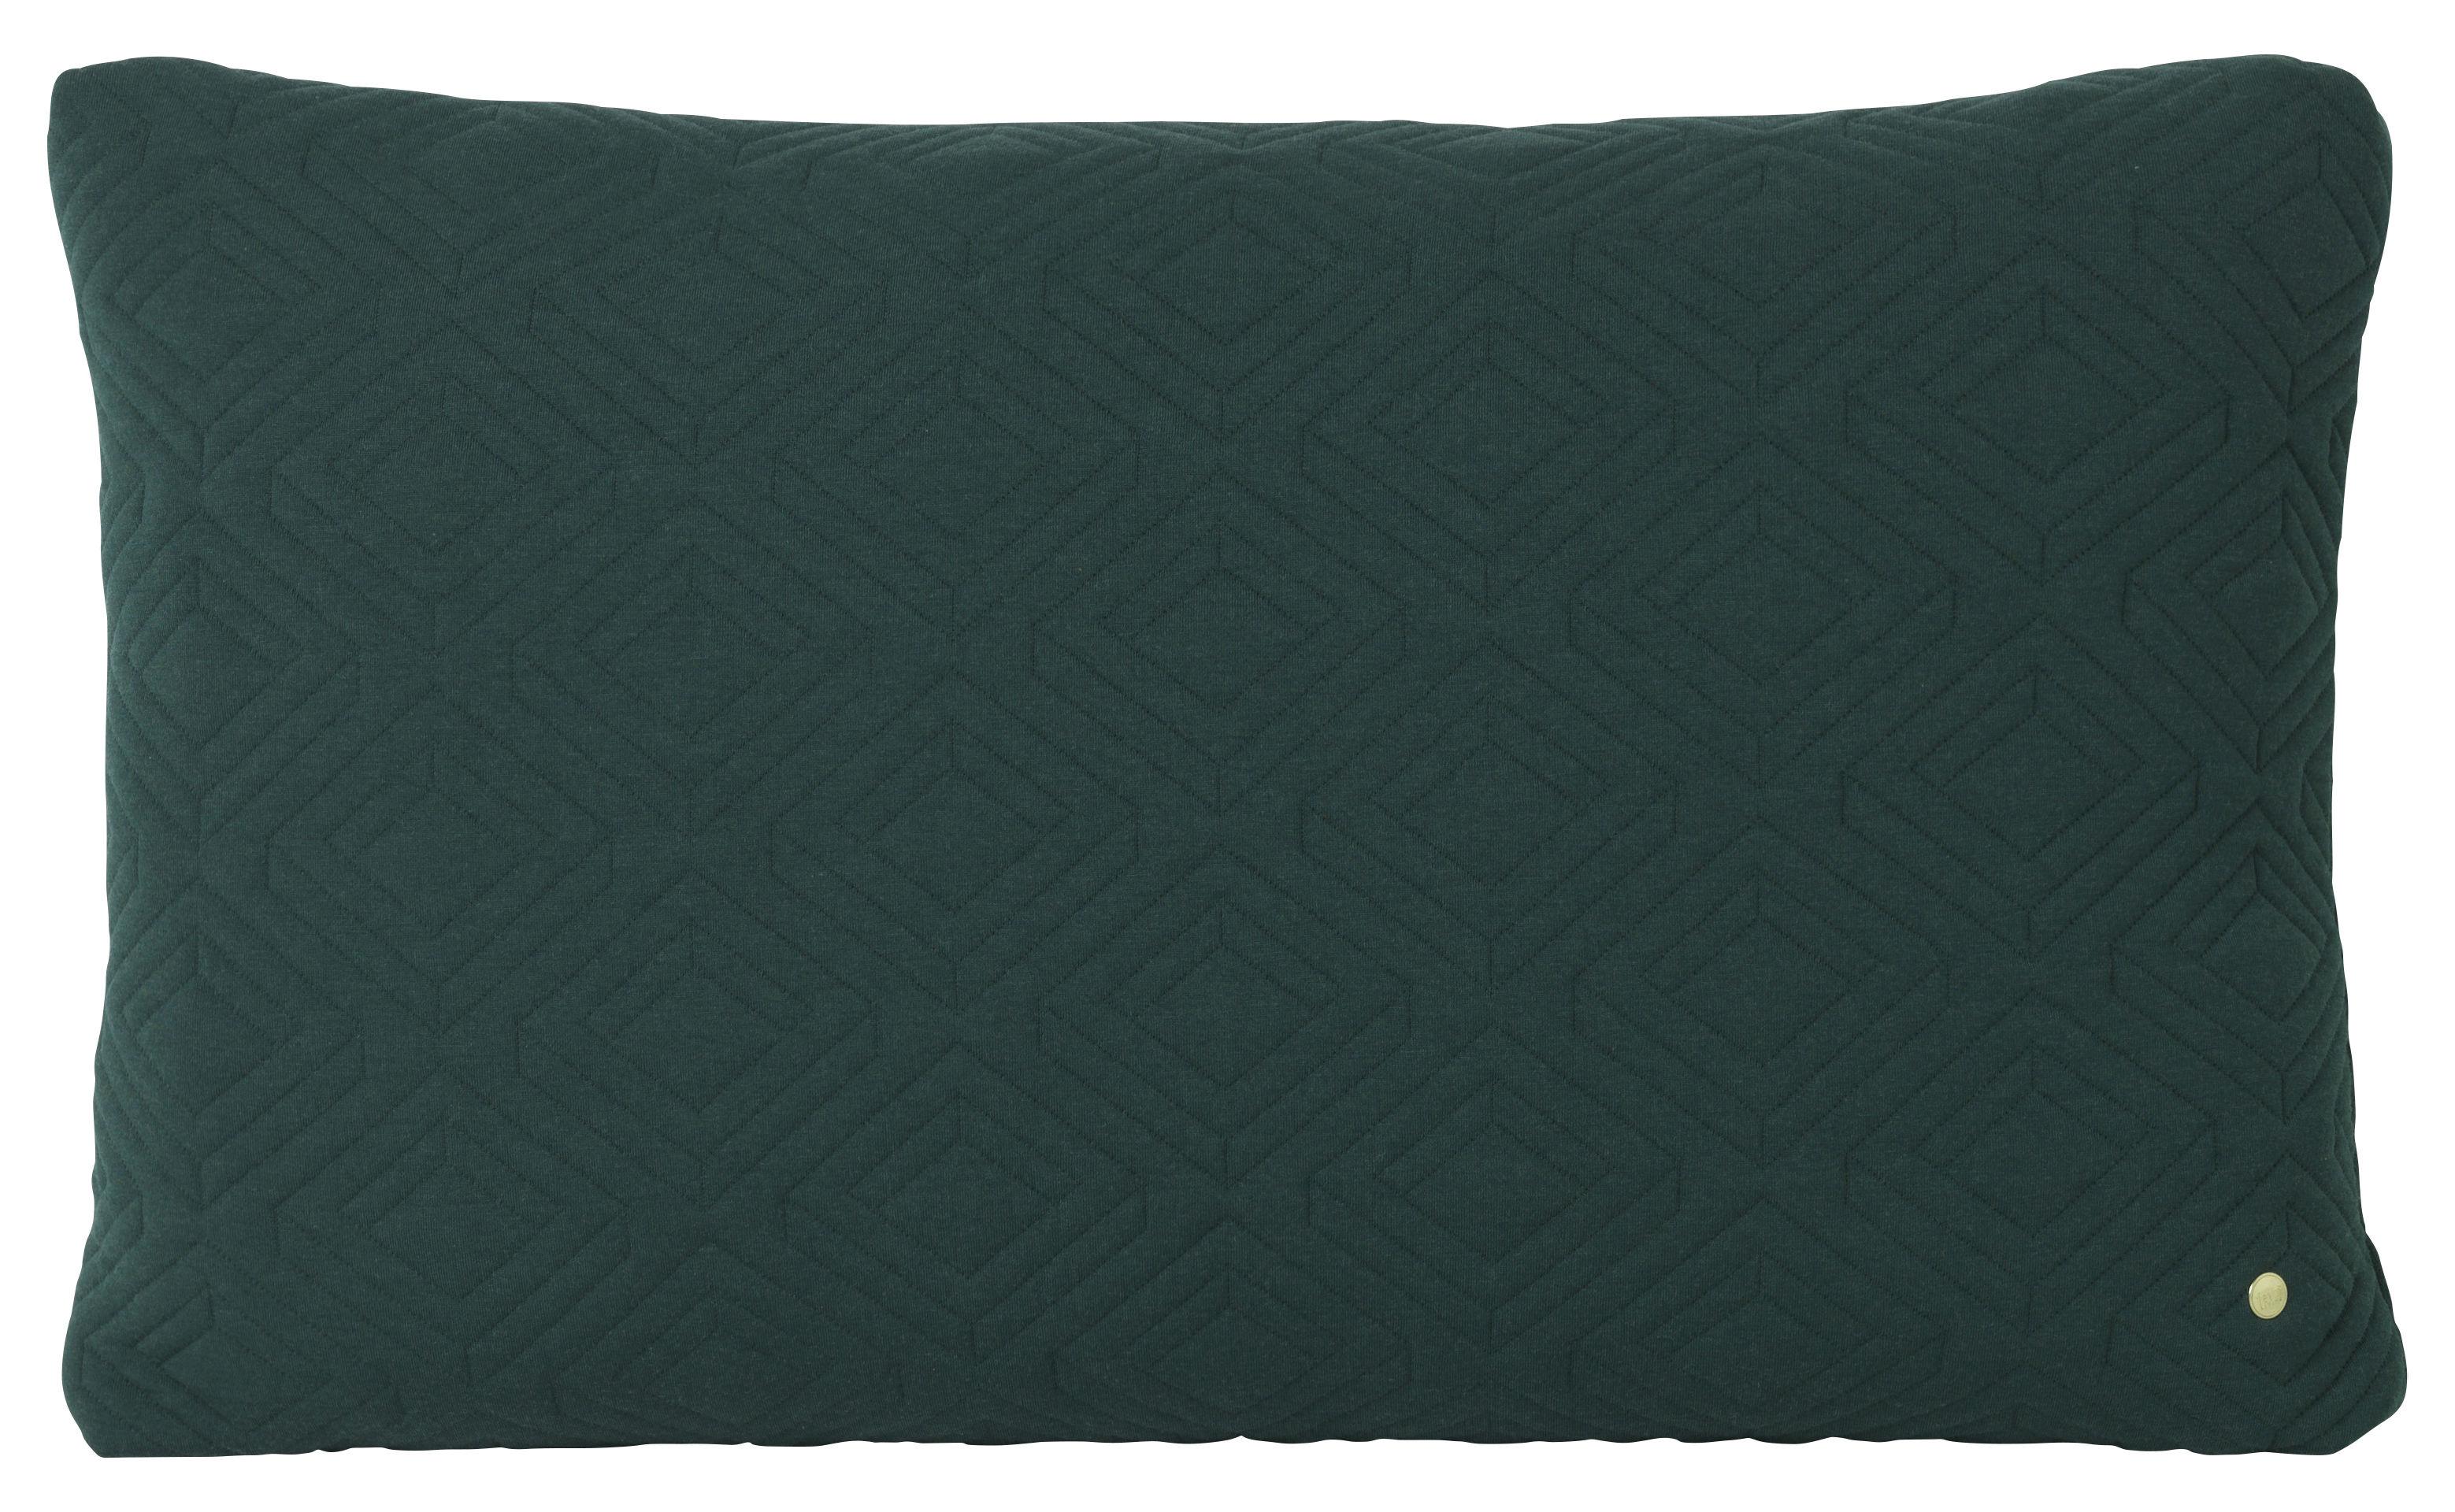 Dekoration - Kissen - Quilt XL Kissen / 80 x 50 cm - Ferm Living - Dunkelgrün - Polyamid, Wolle